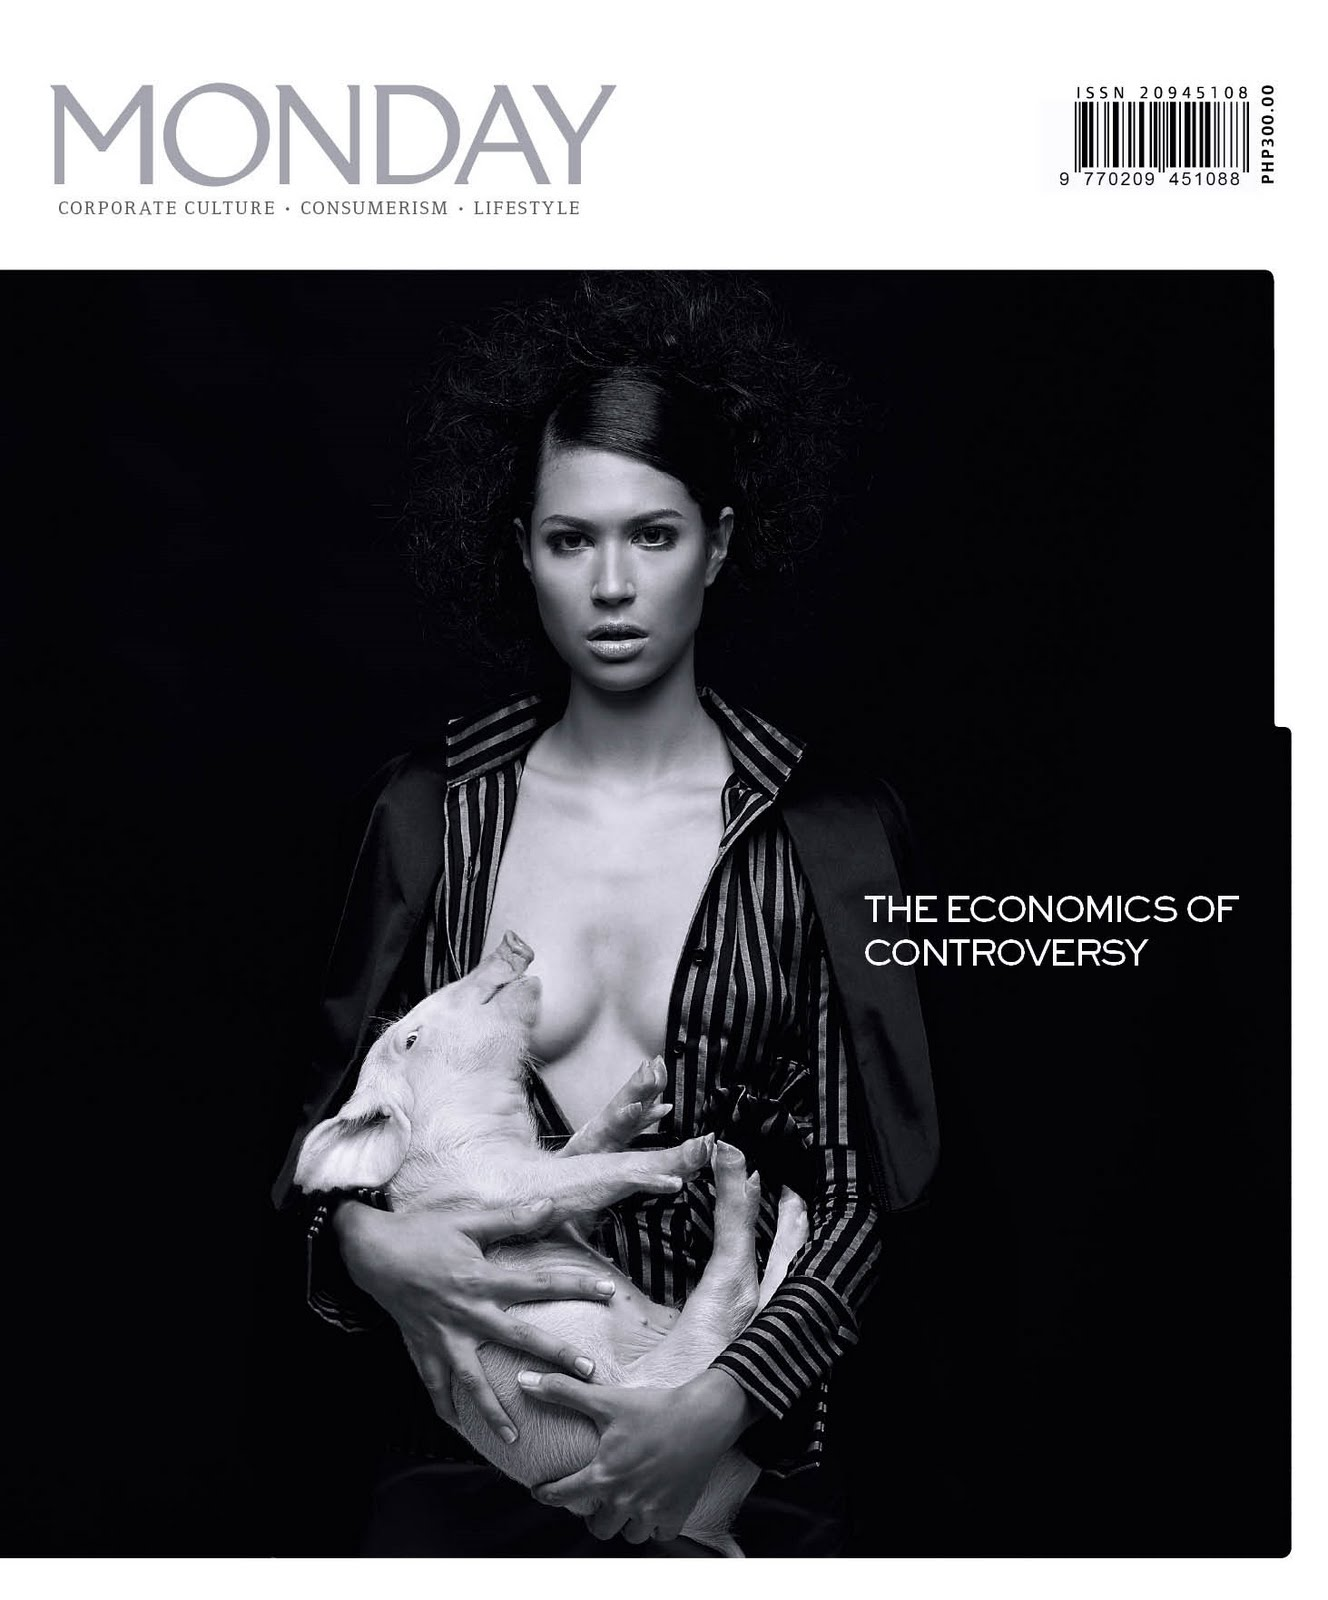 http://4.bp.blogspot.com/_eY8wZBGFW28/TDbLQZFW6xI/AAAAAAAABBc/QTqqpKHDHP0/s1600/Monday+Magazine+Economics+of+Controversy+01.jpg